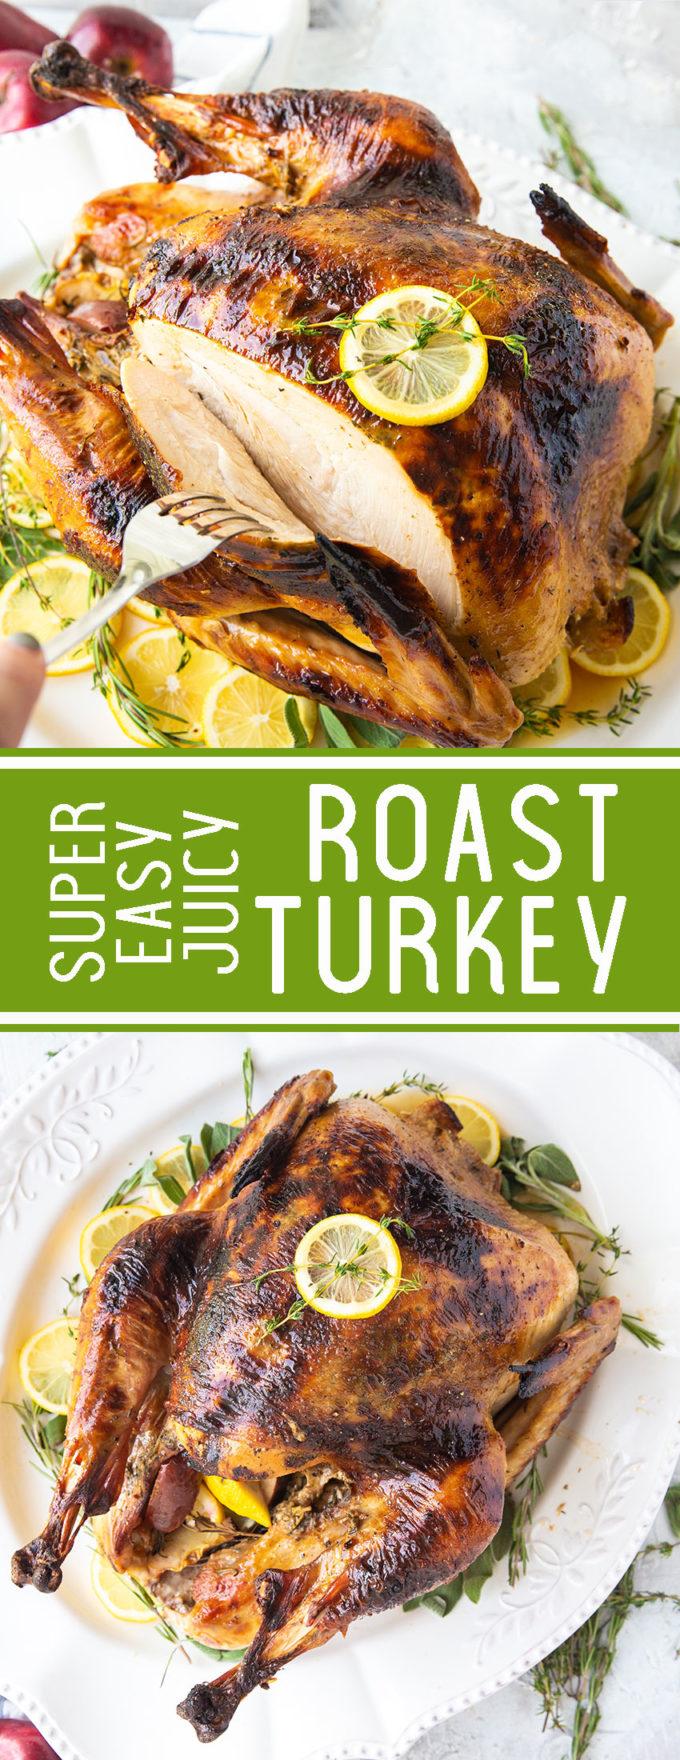 Super easy roast turkey, this juicy thanksgiving menu turkey is amazing.